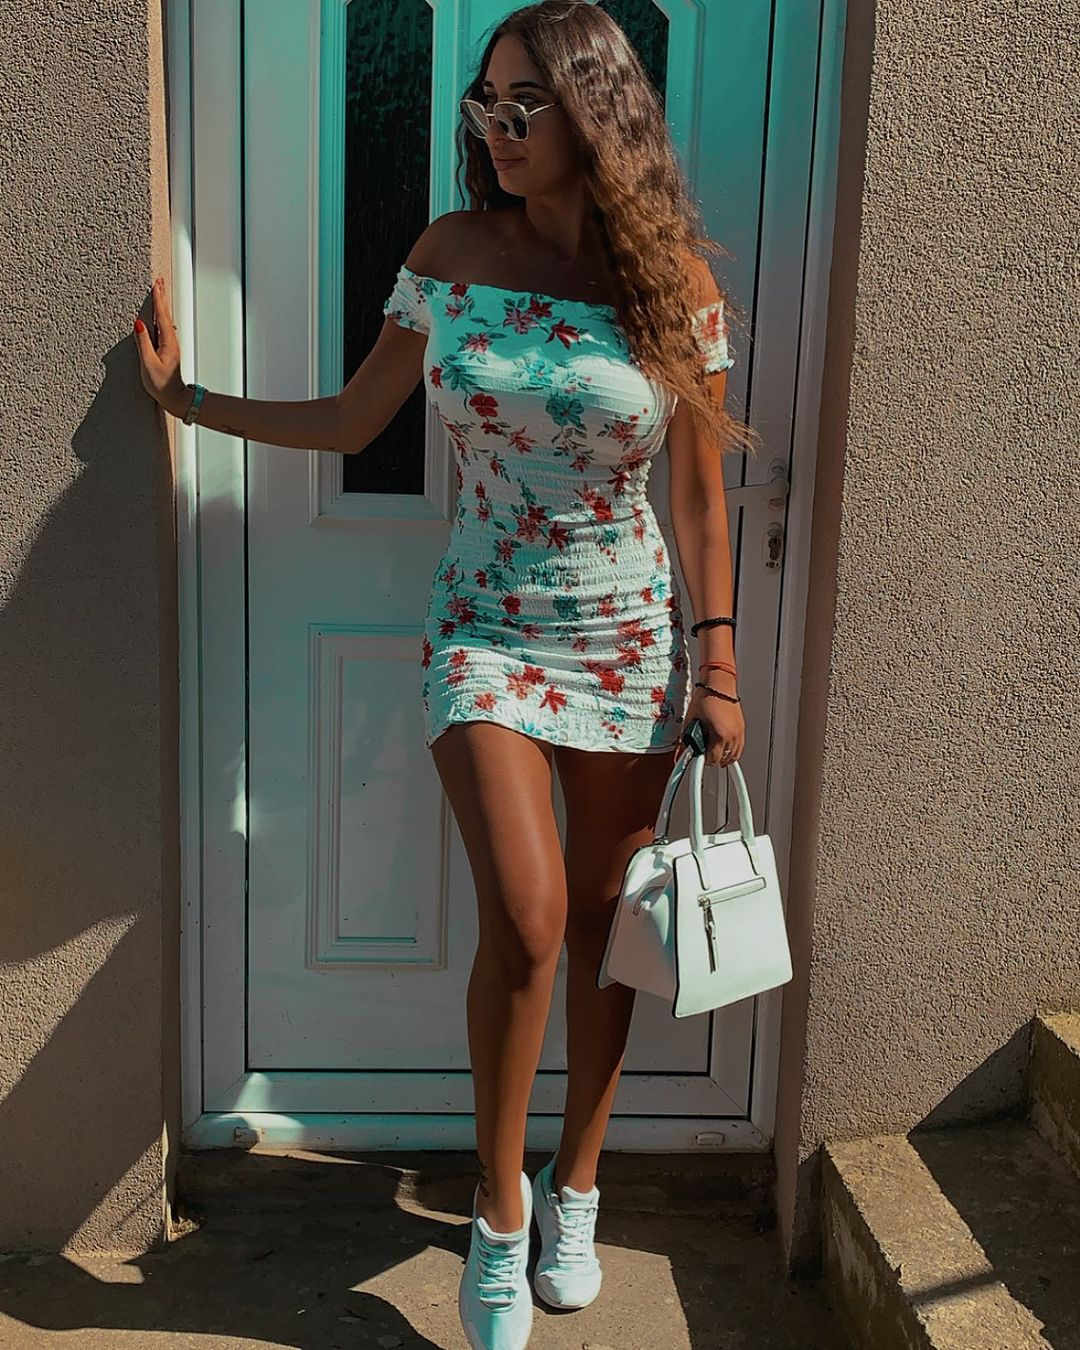 Diana-Mihajlovic-Wallpapers-Insta-Fit-Bio-8